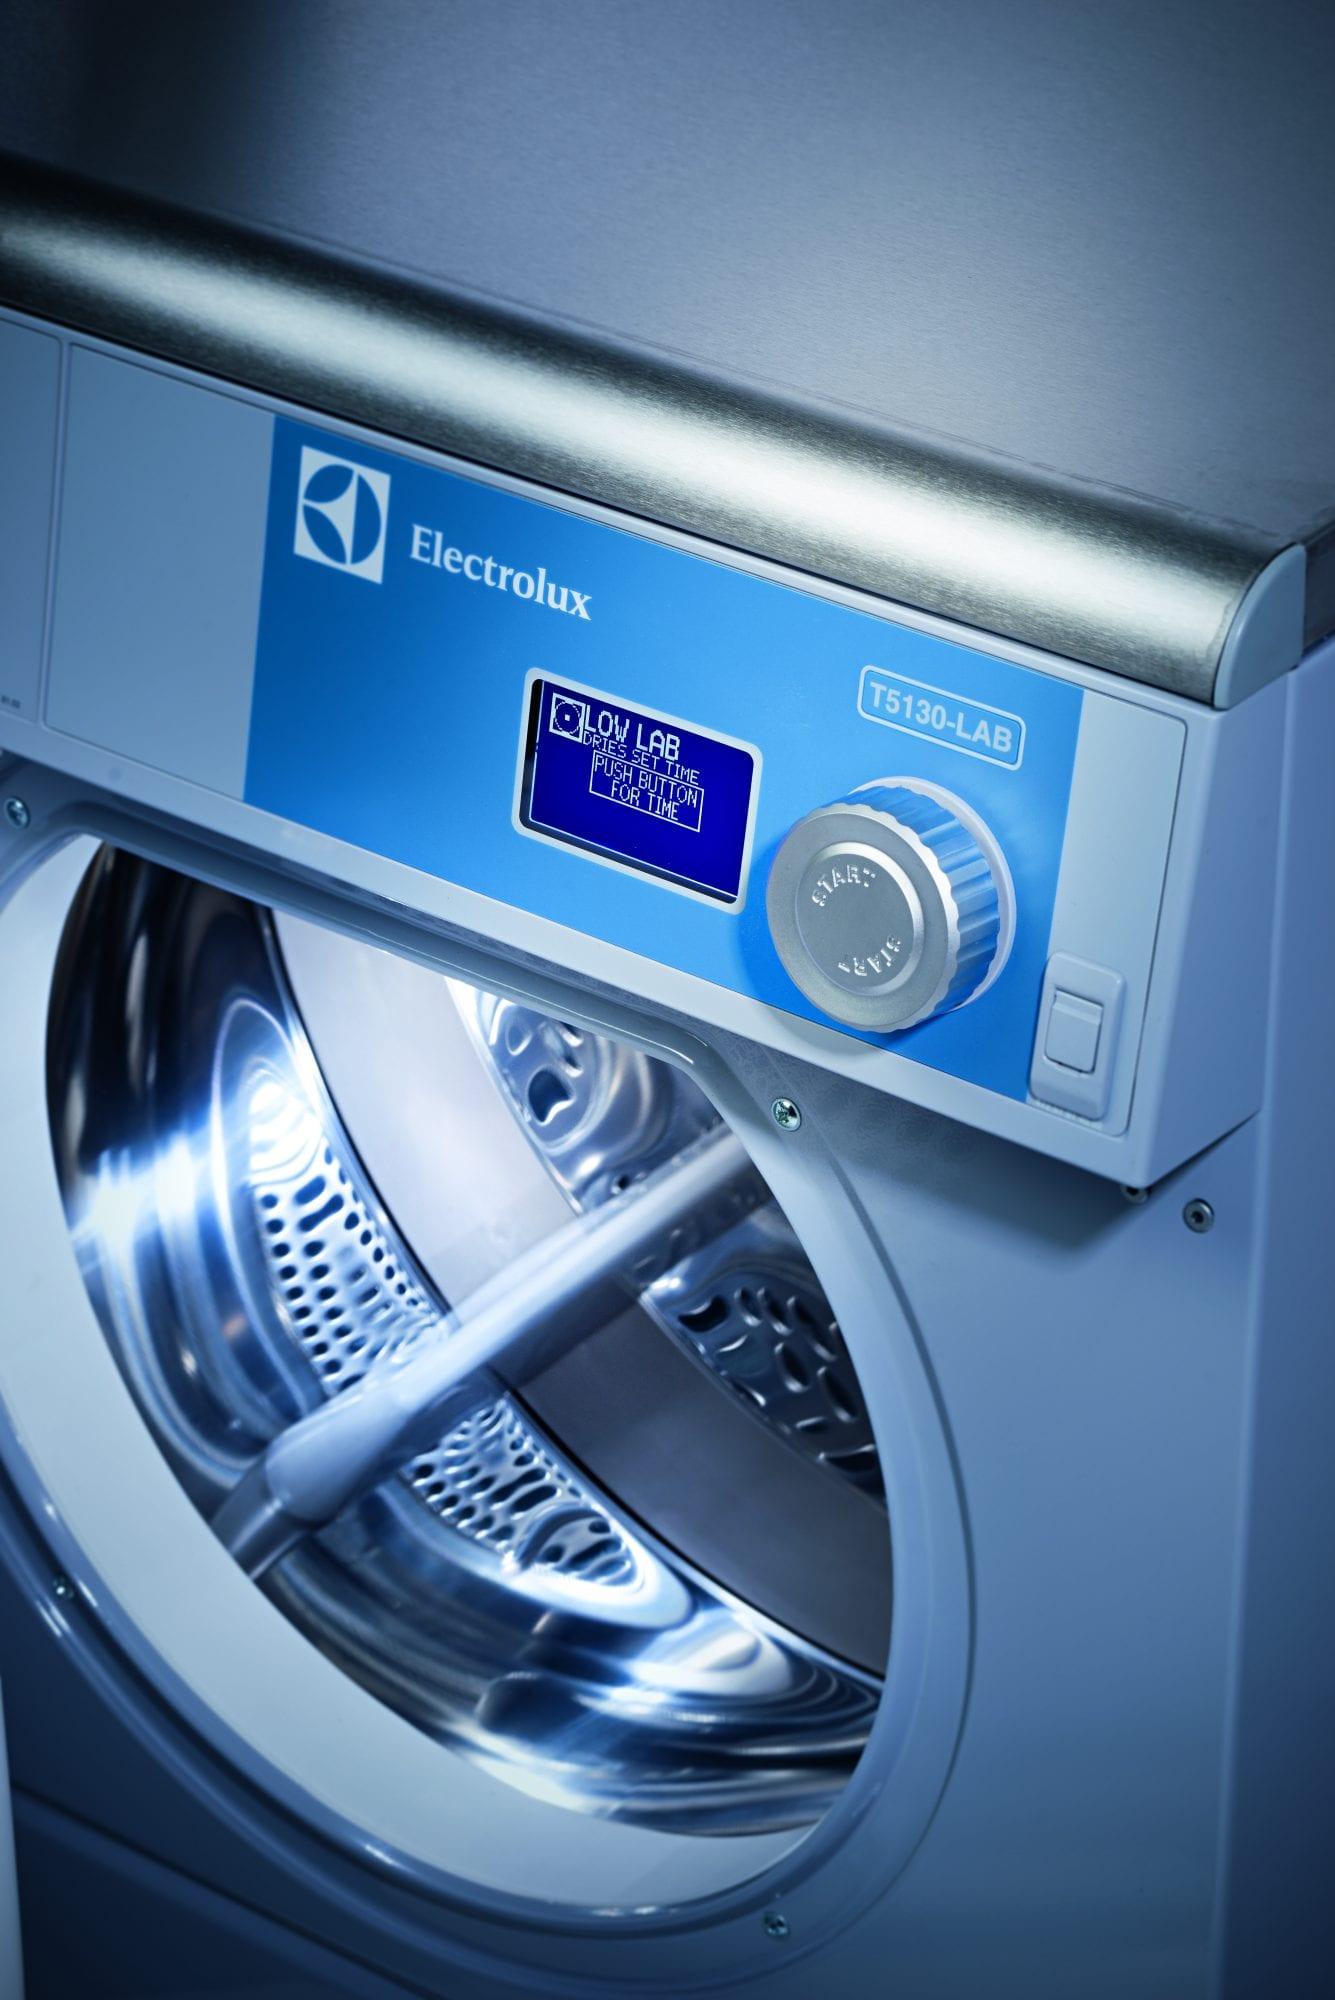 Textile Laboratory Machines Electrolux Professional